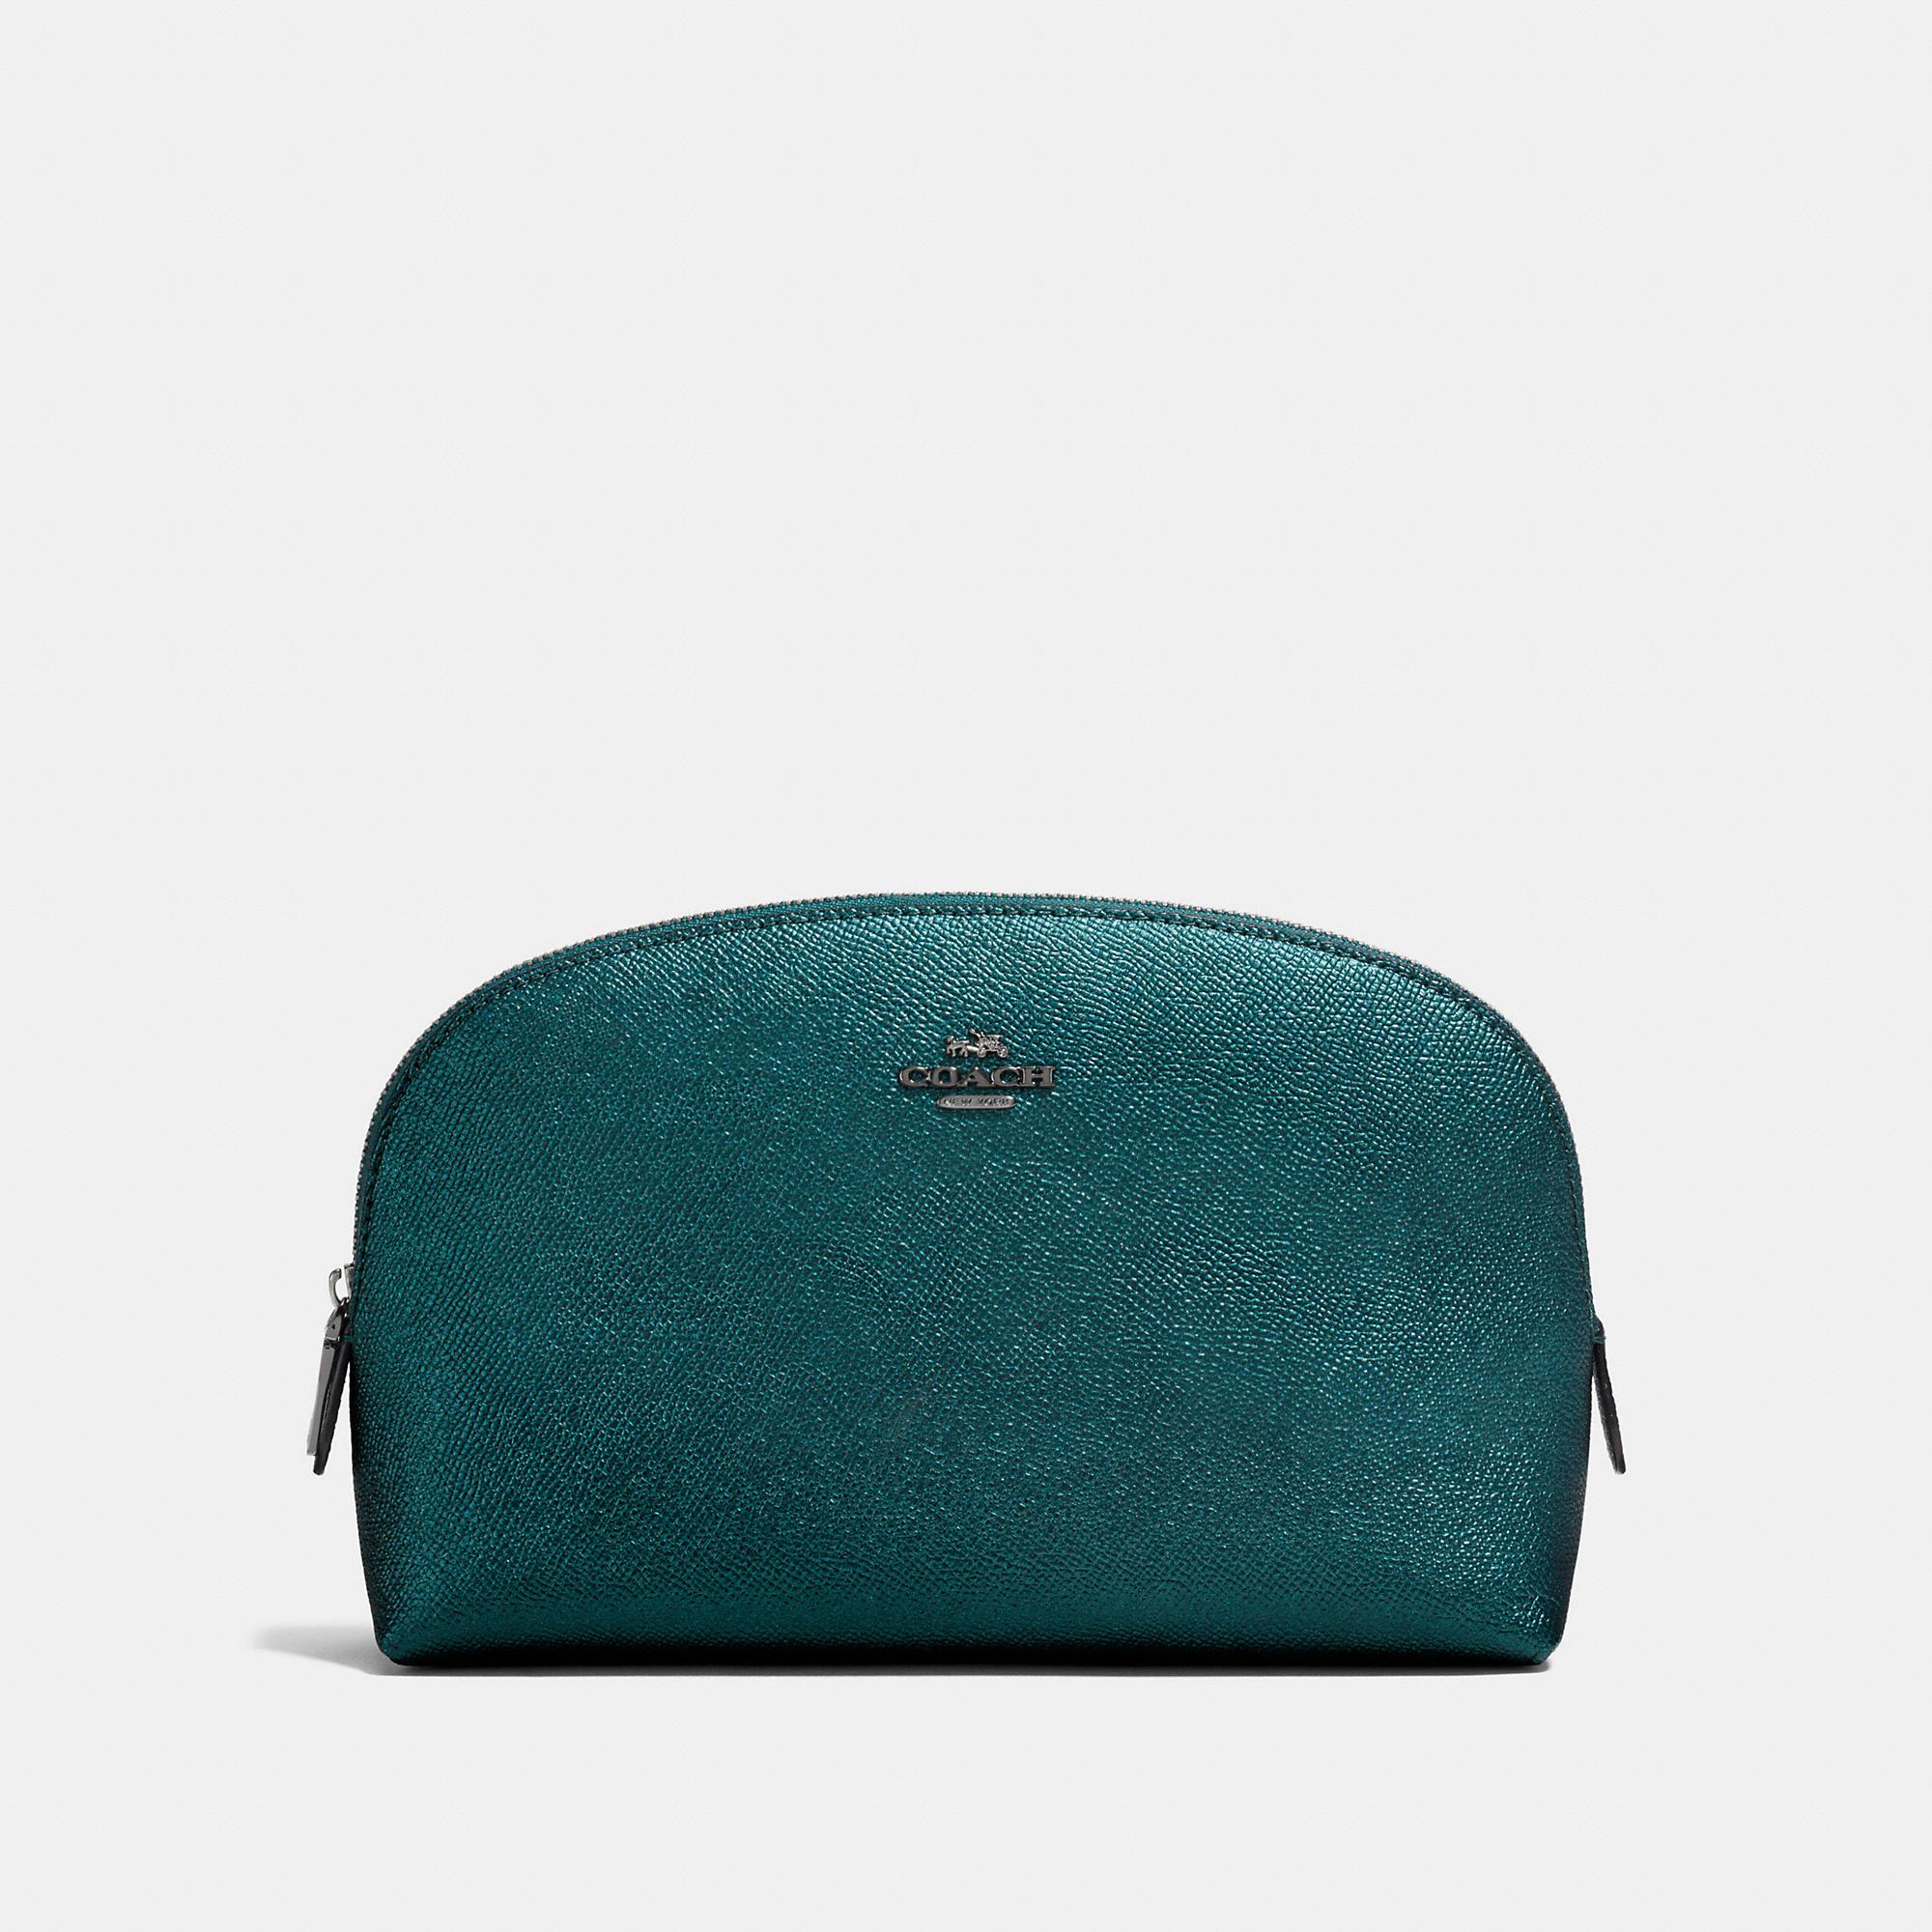 Coach Cosmetic Case 22 In Metallic Leather